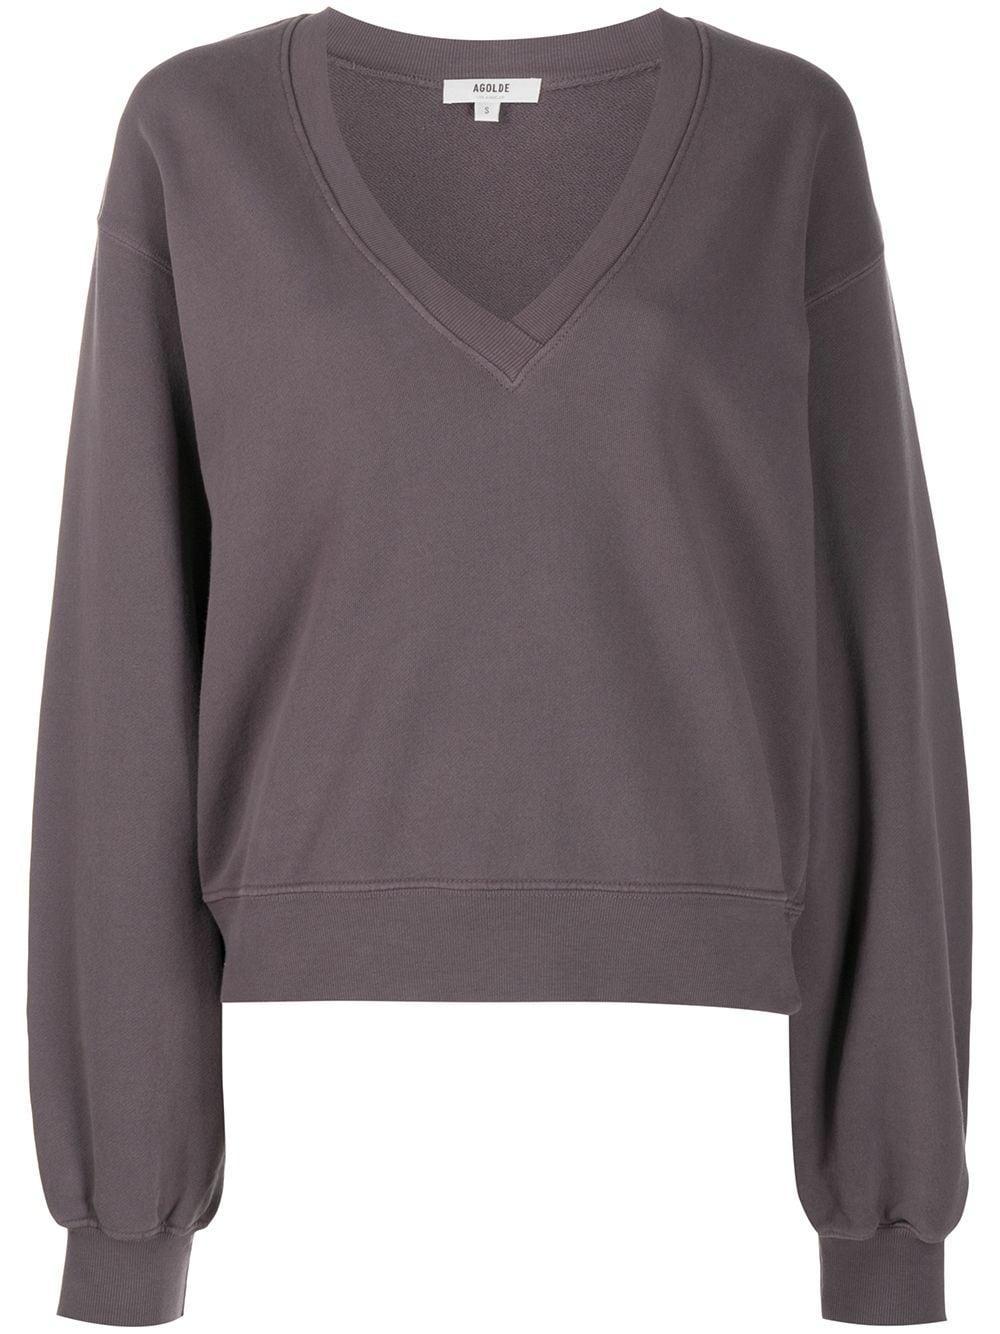 Balloon Sleeve V- Neck Sweatshirt Item # A7057